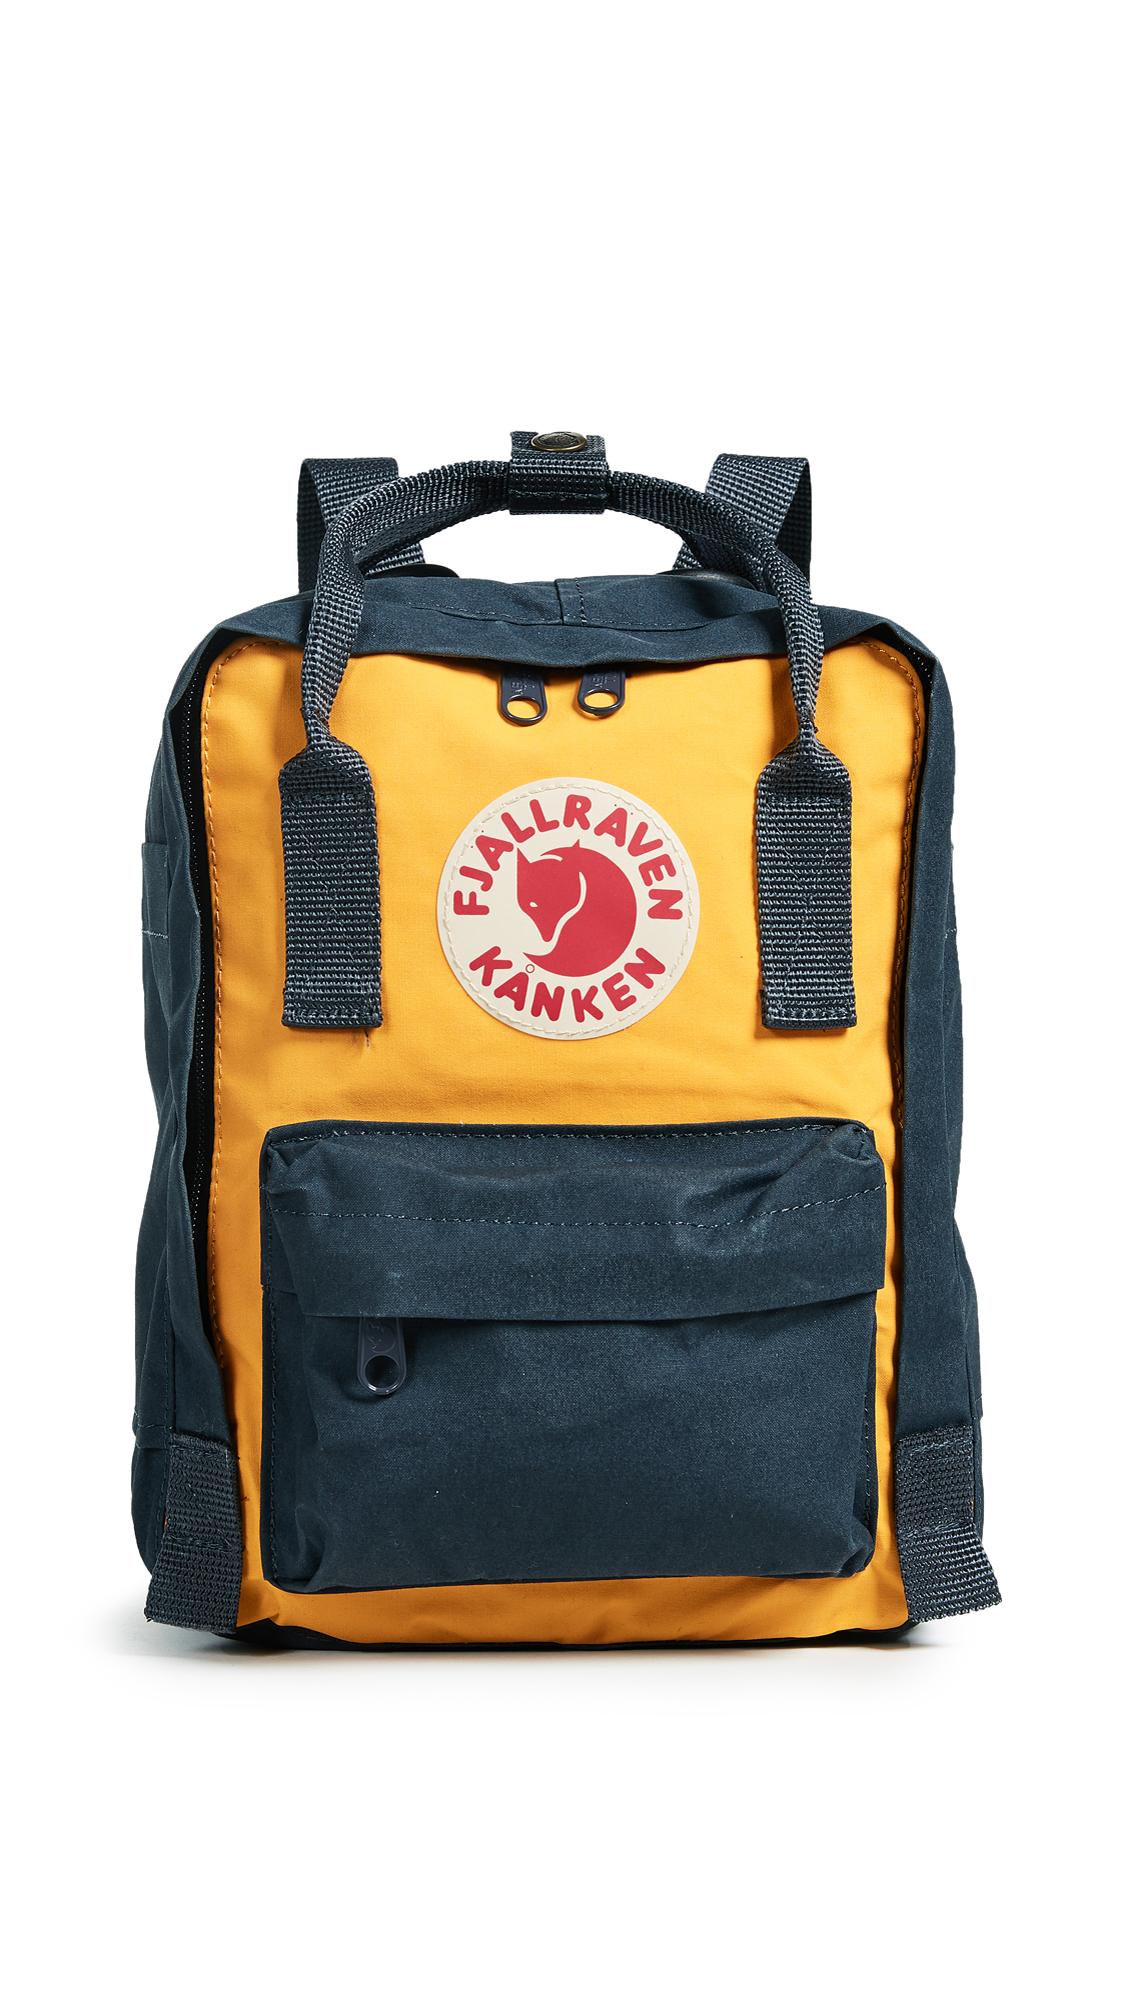 Fjallraven Kanken Mini Backpack - Navy/Warm Yellow